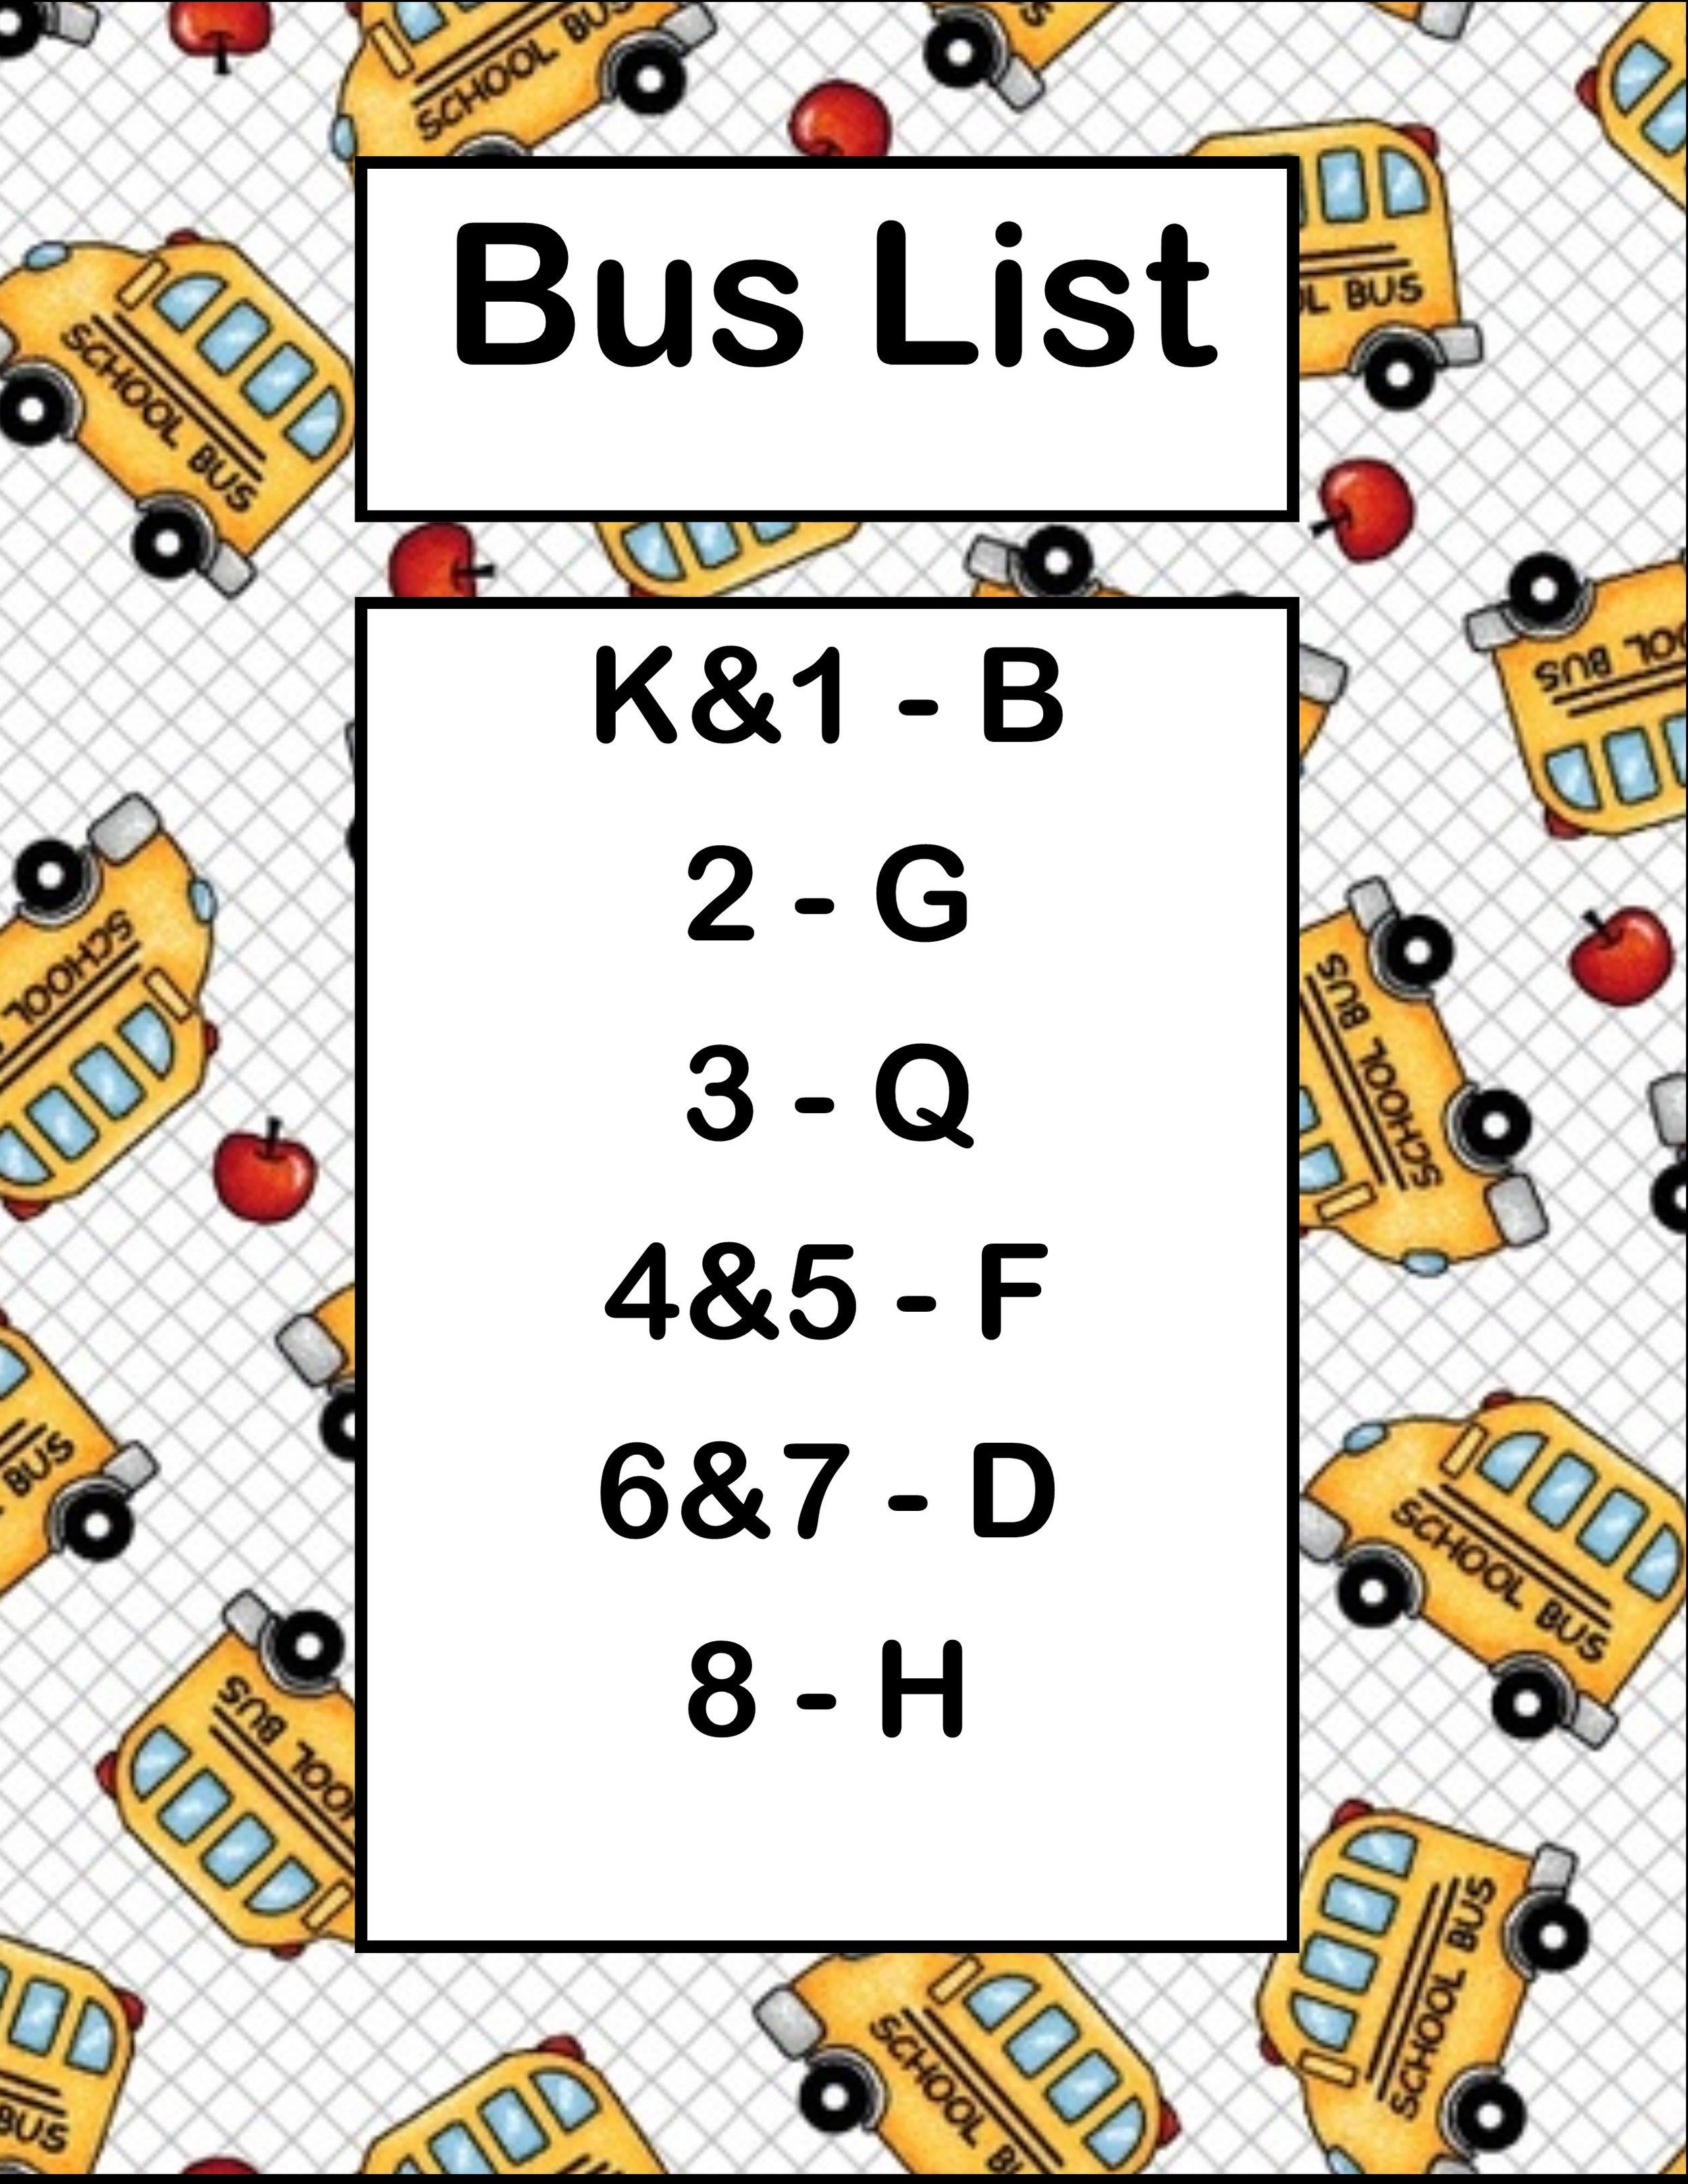 Bus List.jpg